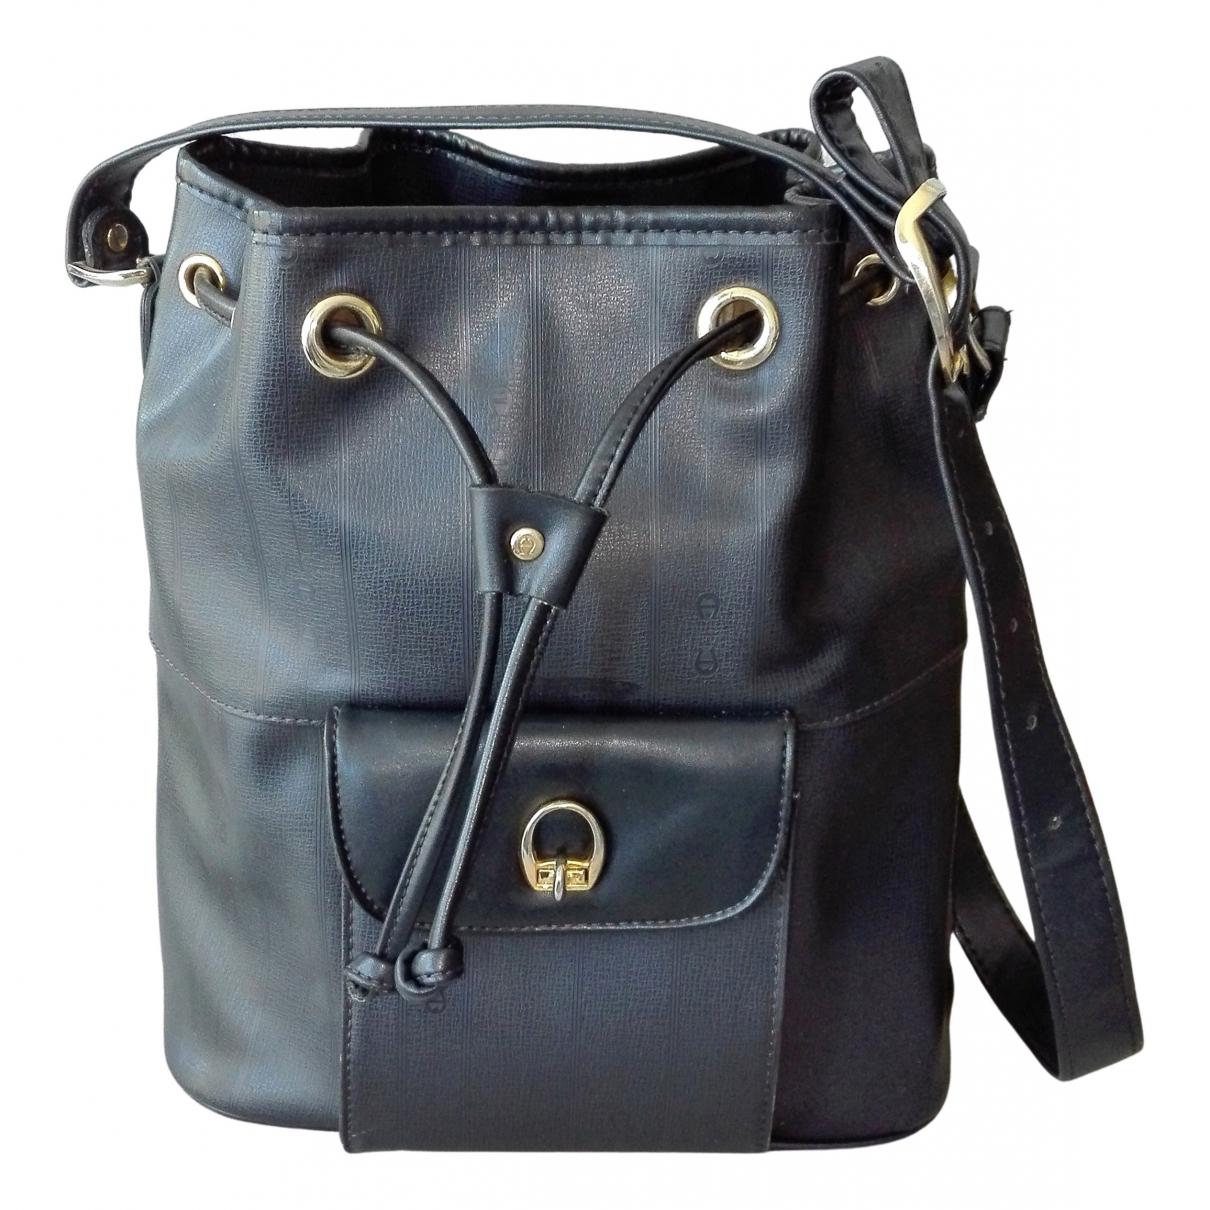 Etienne Aigner \N Black handbag for Women \N